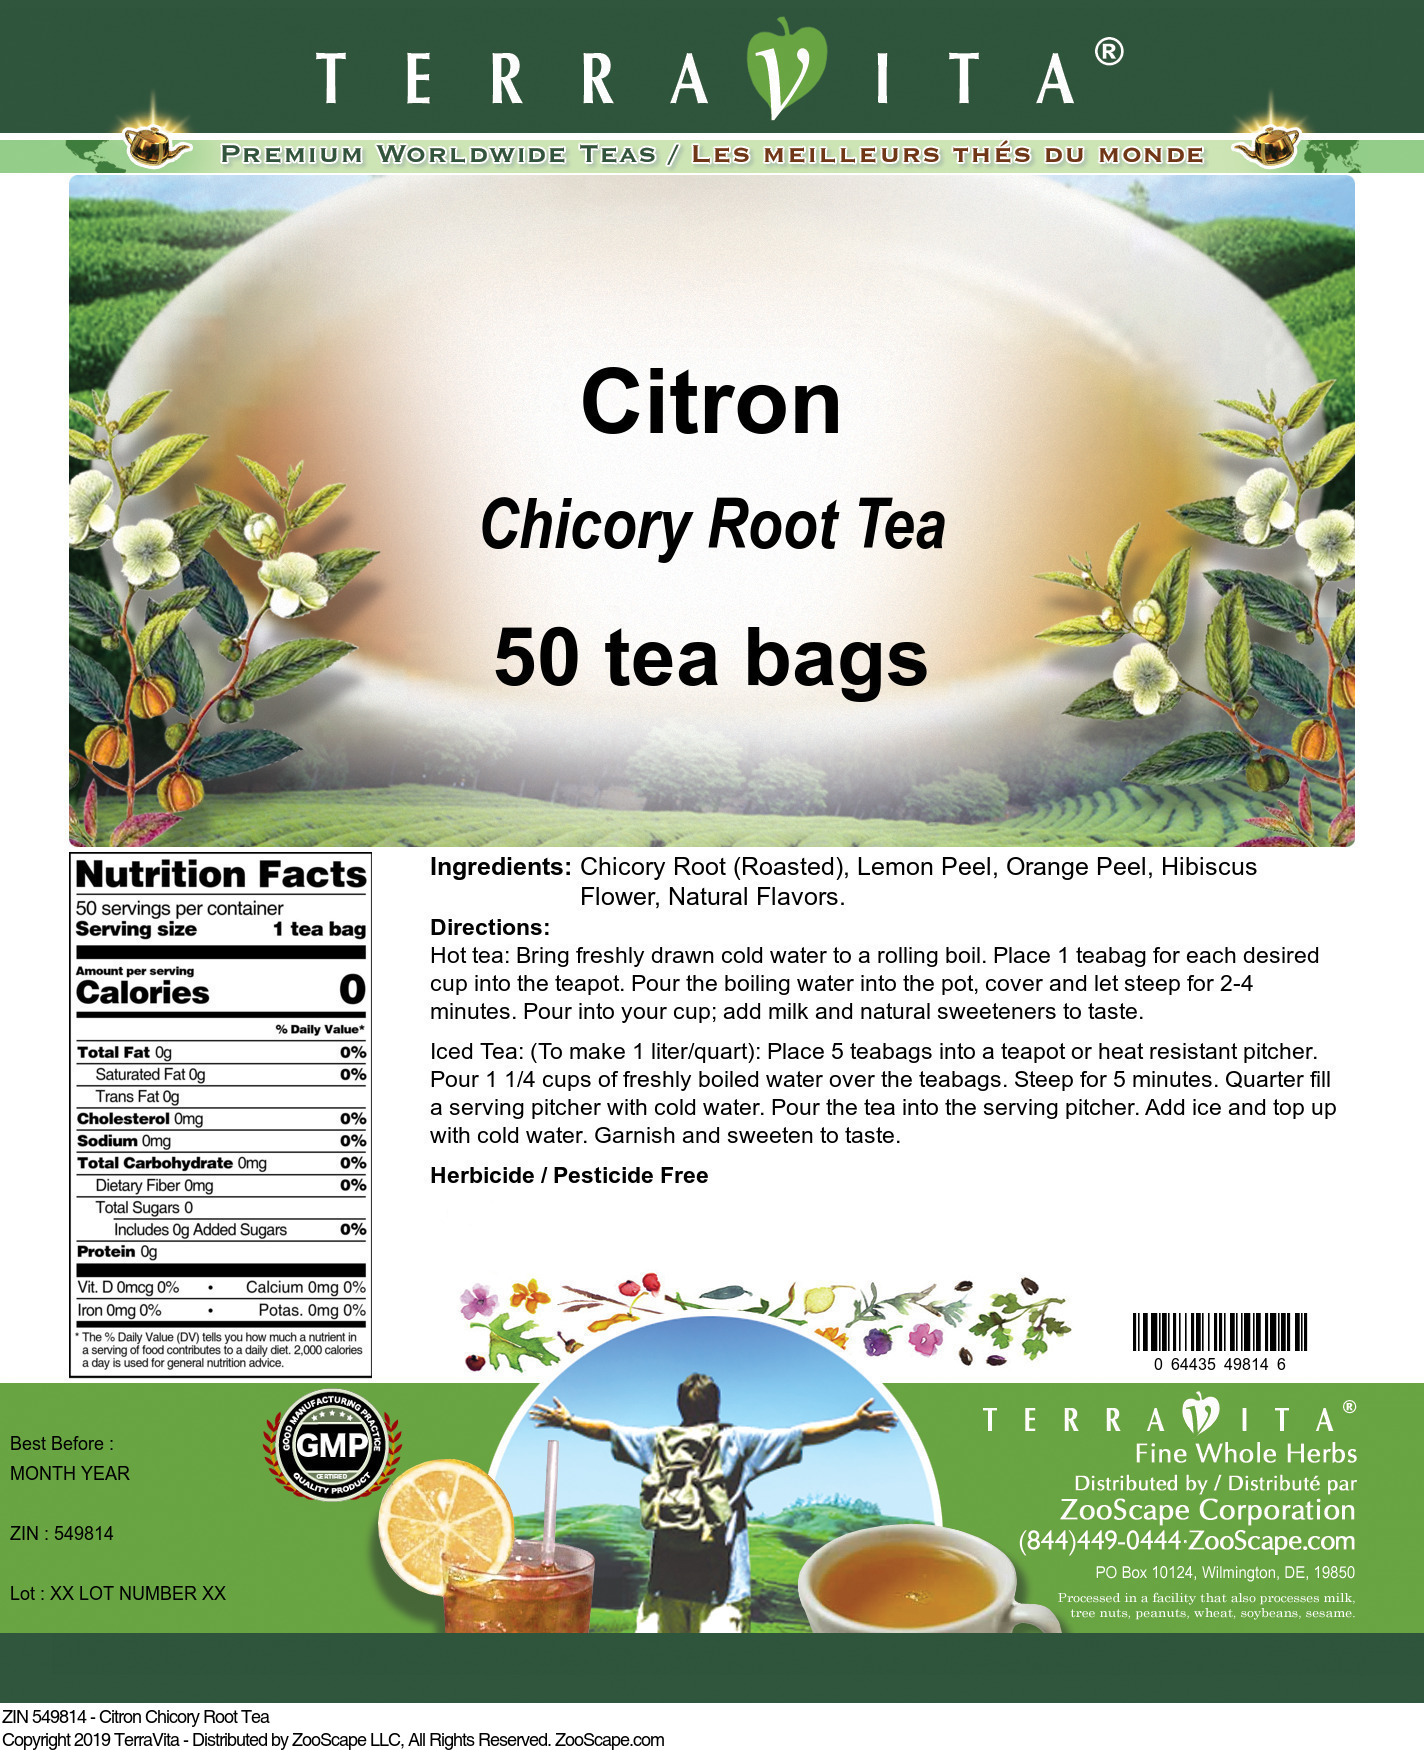 Citron Chicory Root